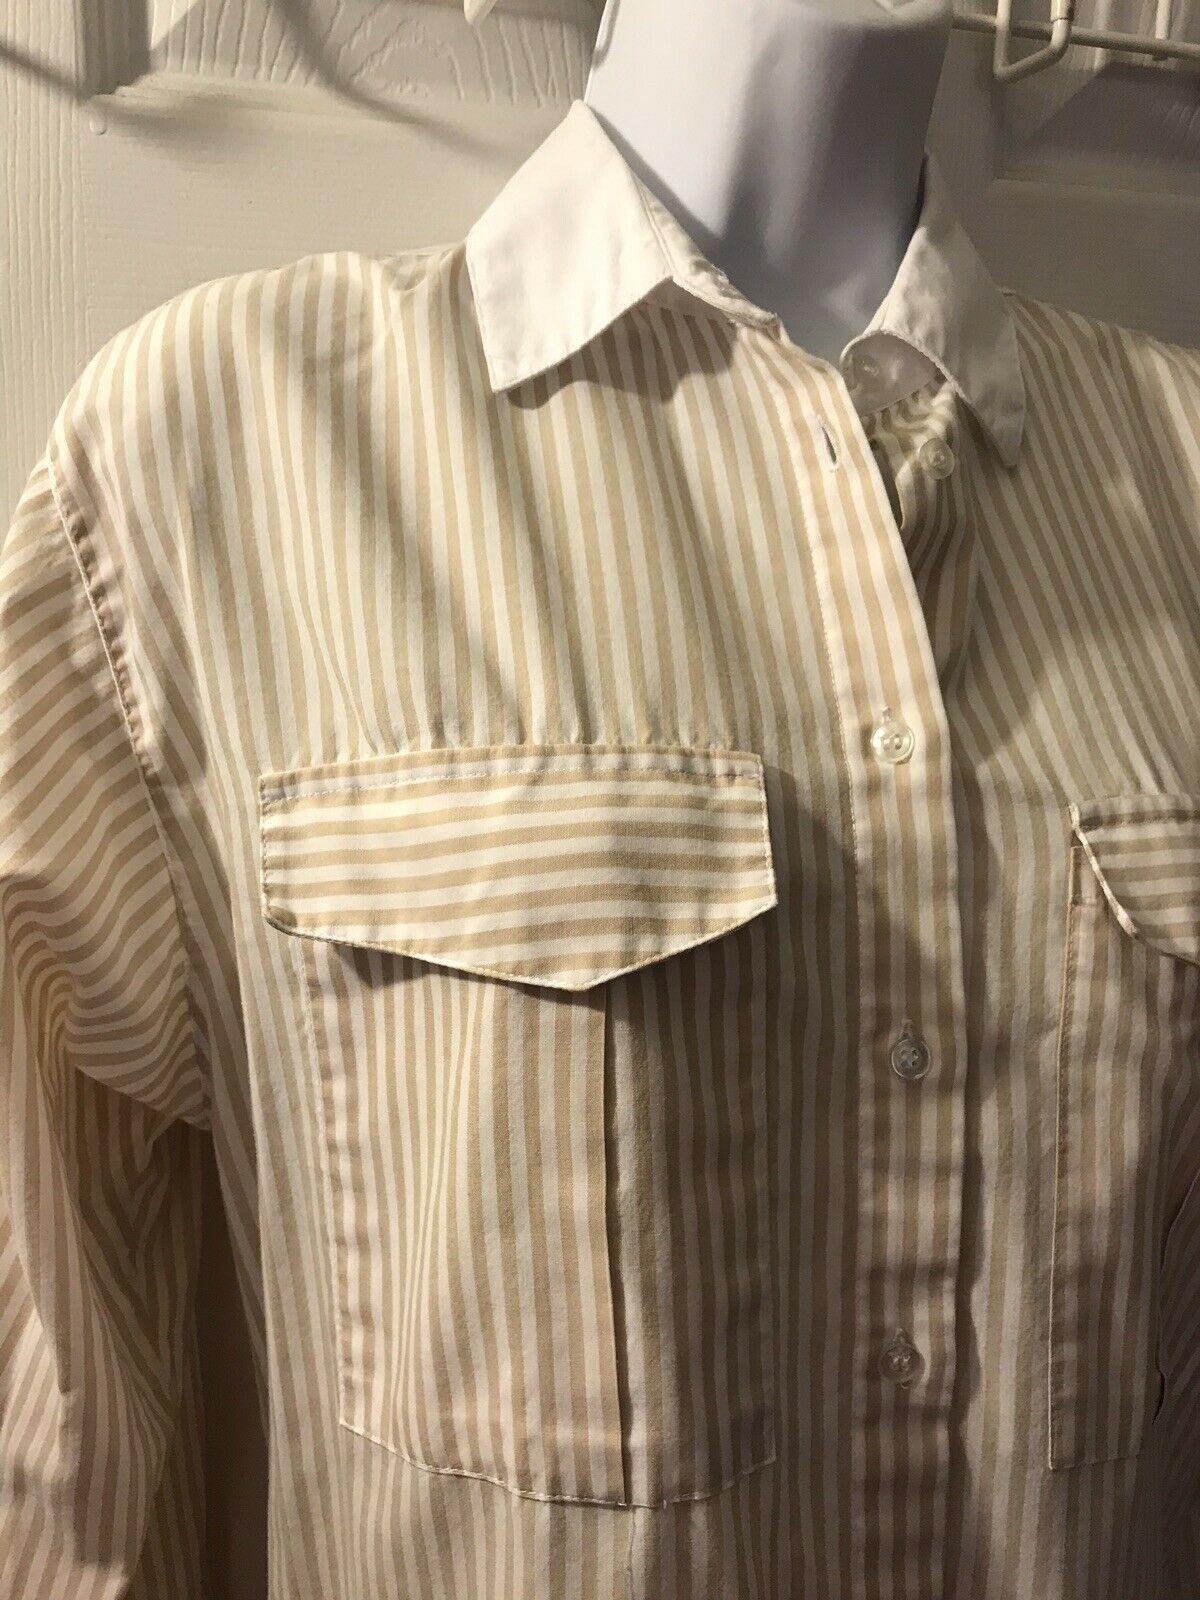 Vtg DIANE VON FURSTENBERG Striped Button Down Shirt DVF White Tan Blouse Top 14 image 3